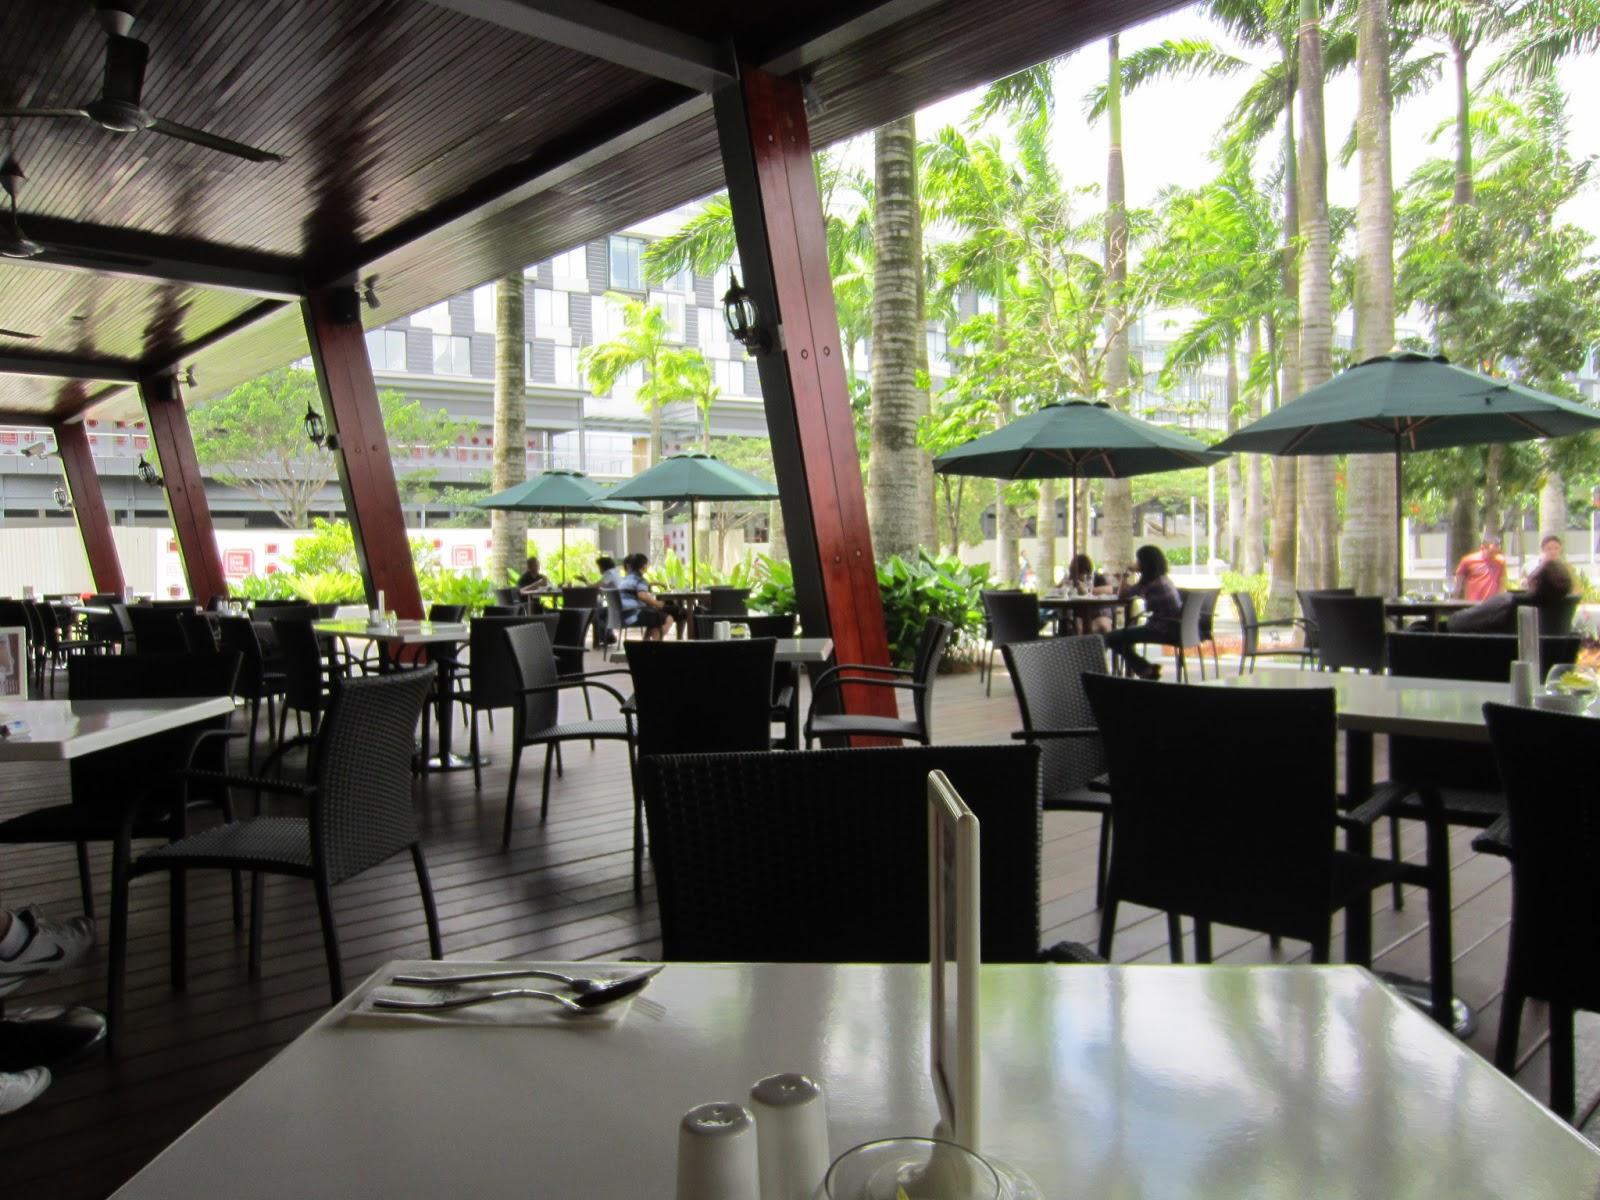 johor kaki blog johorkaki singapore travel food lifstyle johor